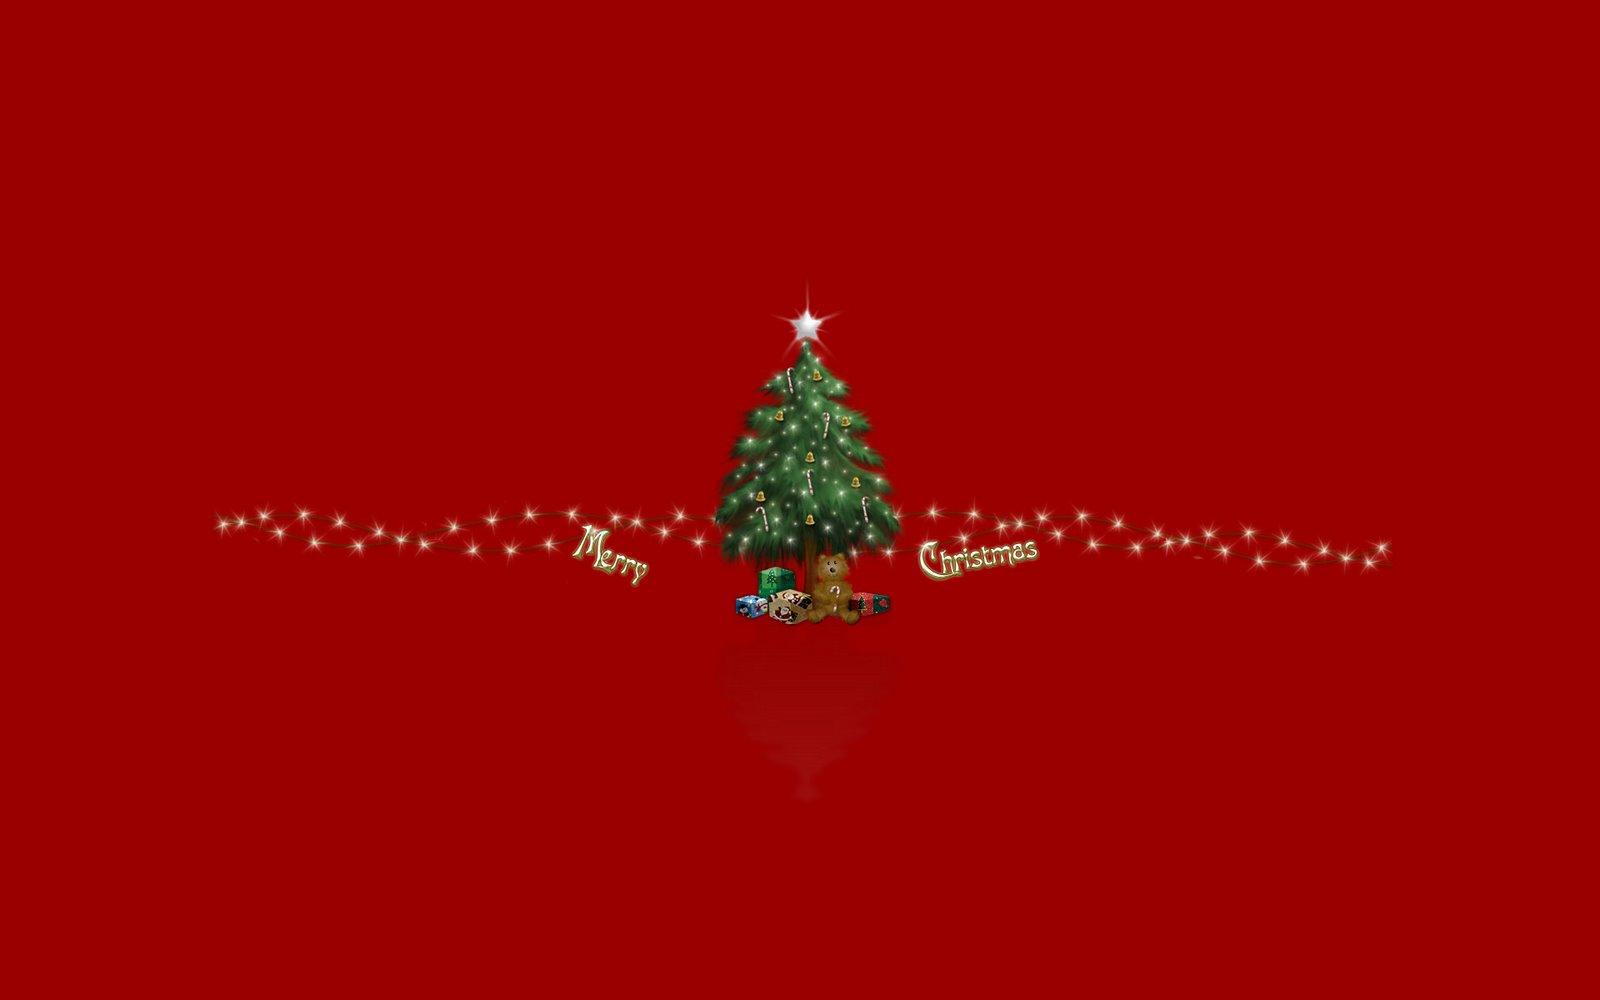 Christmas hd wallpapers free hd wallpapers - Holiday wallpaper hd ...